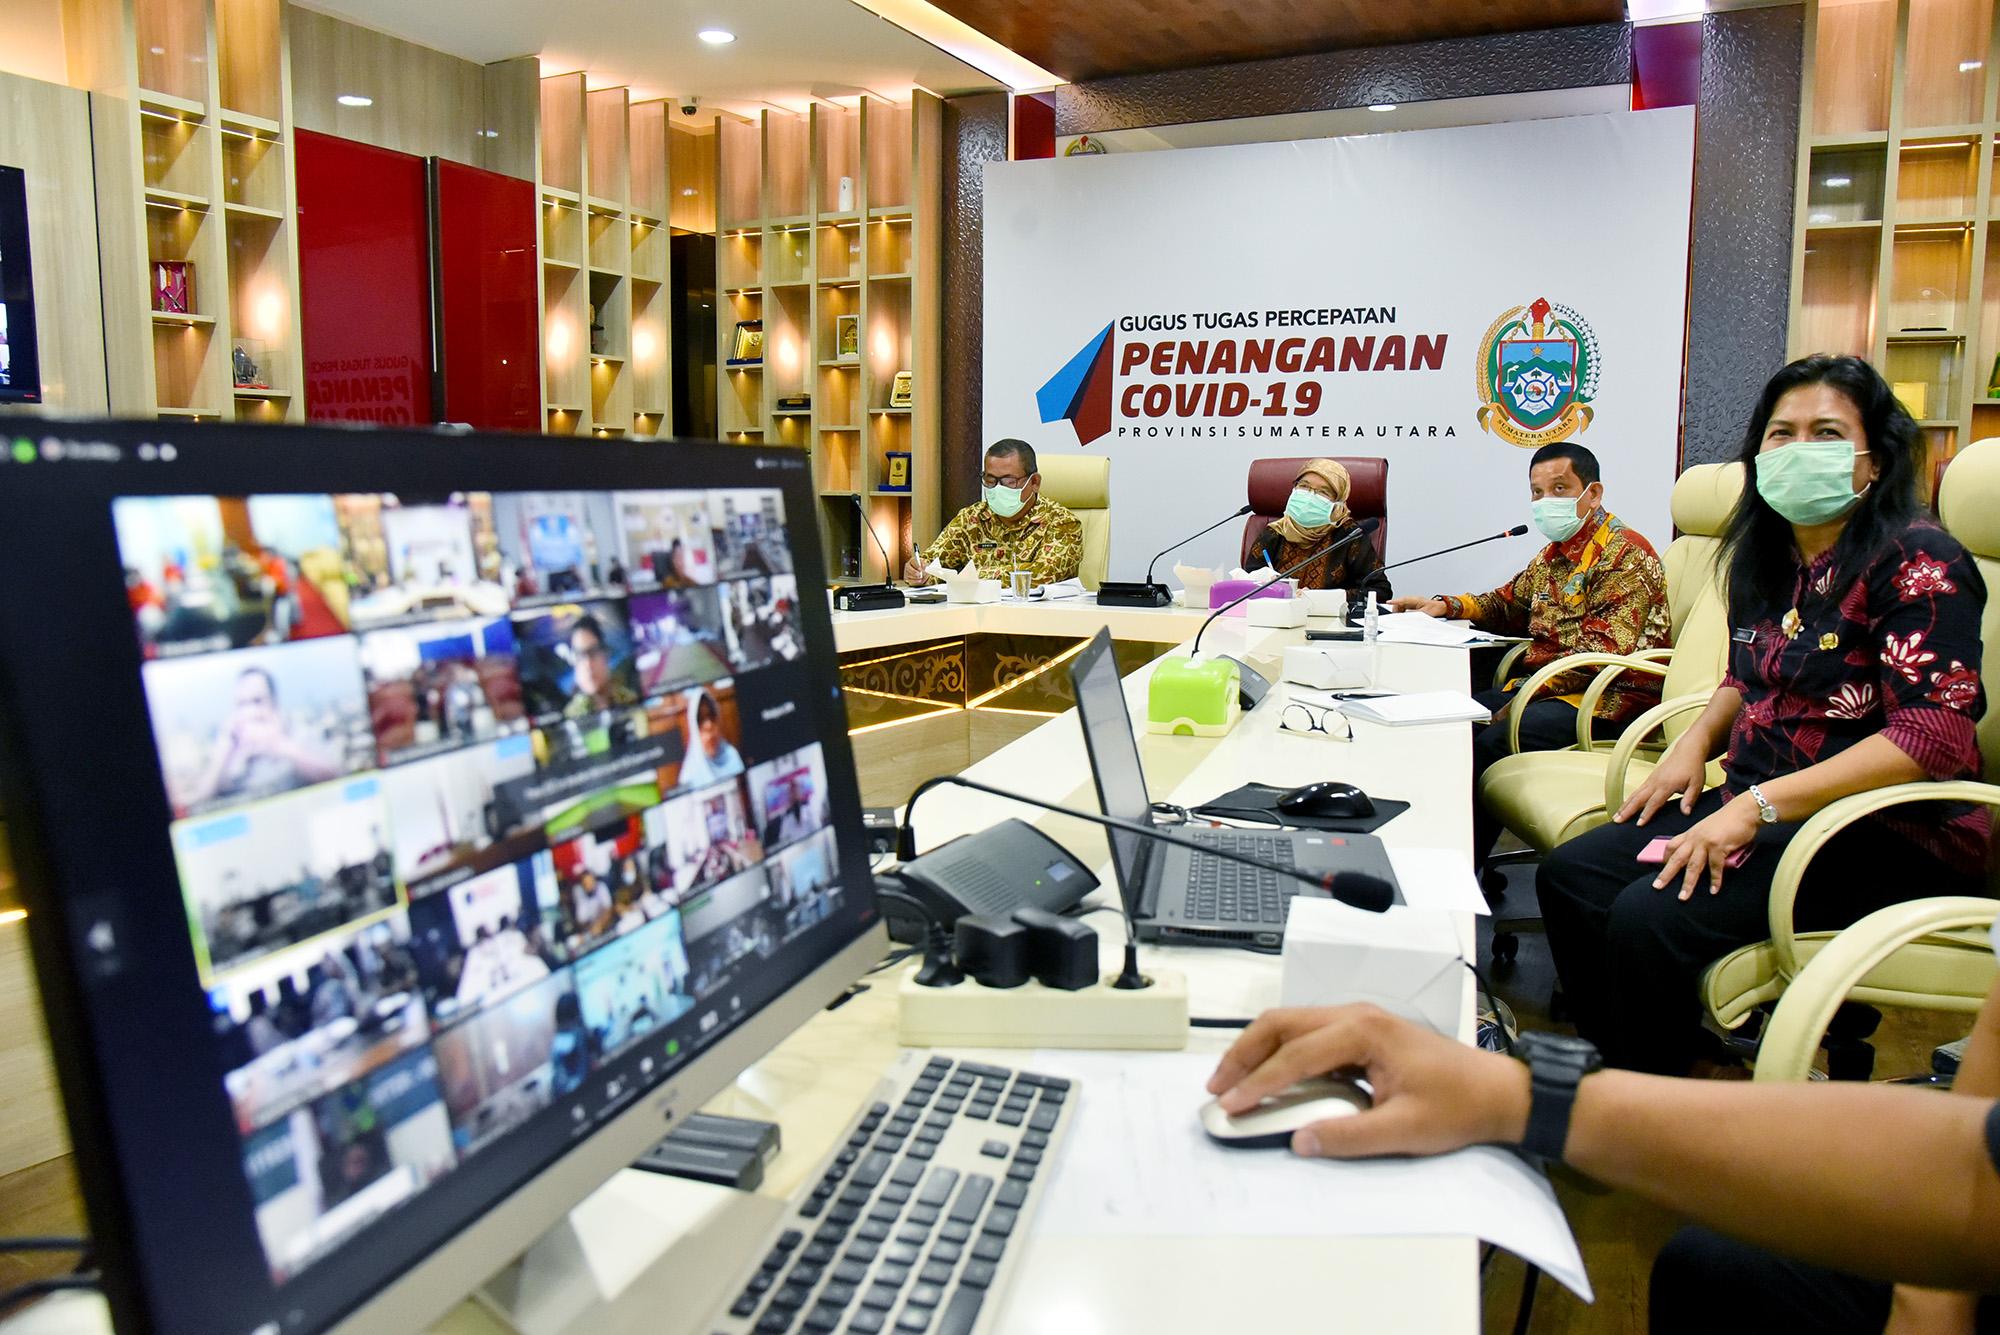 Sekretaris Daerah Provinsi Sumatera Utara (Sumut) R Sabrina mengikuti rapat teleconference denganKepala Satuan Tugas (Kasatgas) Koordinasi dan Supervisi Pencegahan Korupsi (Korsupgah) wilayah I Maruli Tua. Foto Biro Humas dan Keprotokolan Setdaprov Sumut/ Veri Ardian.